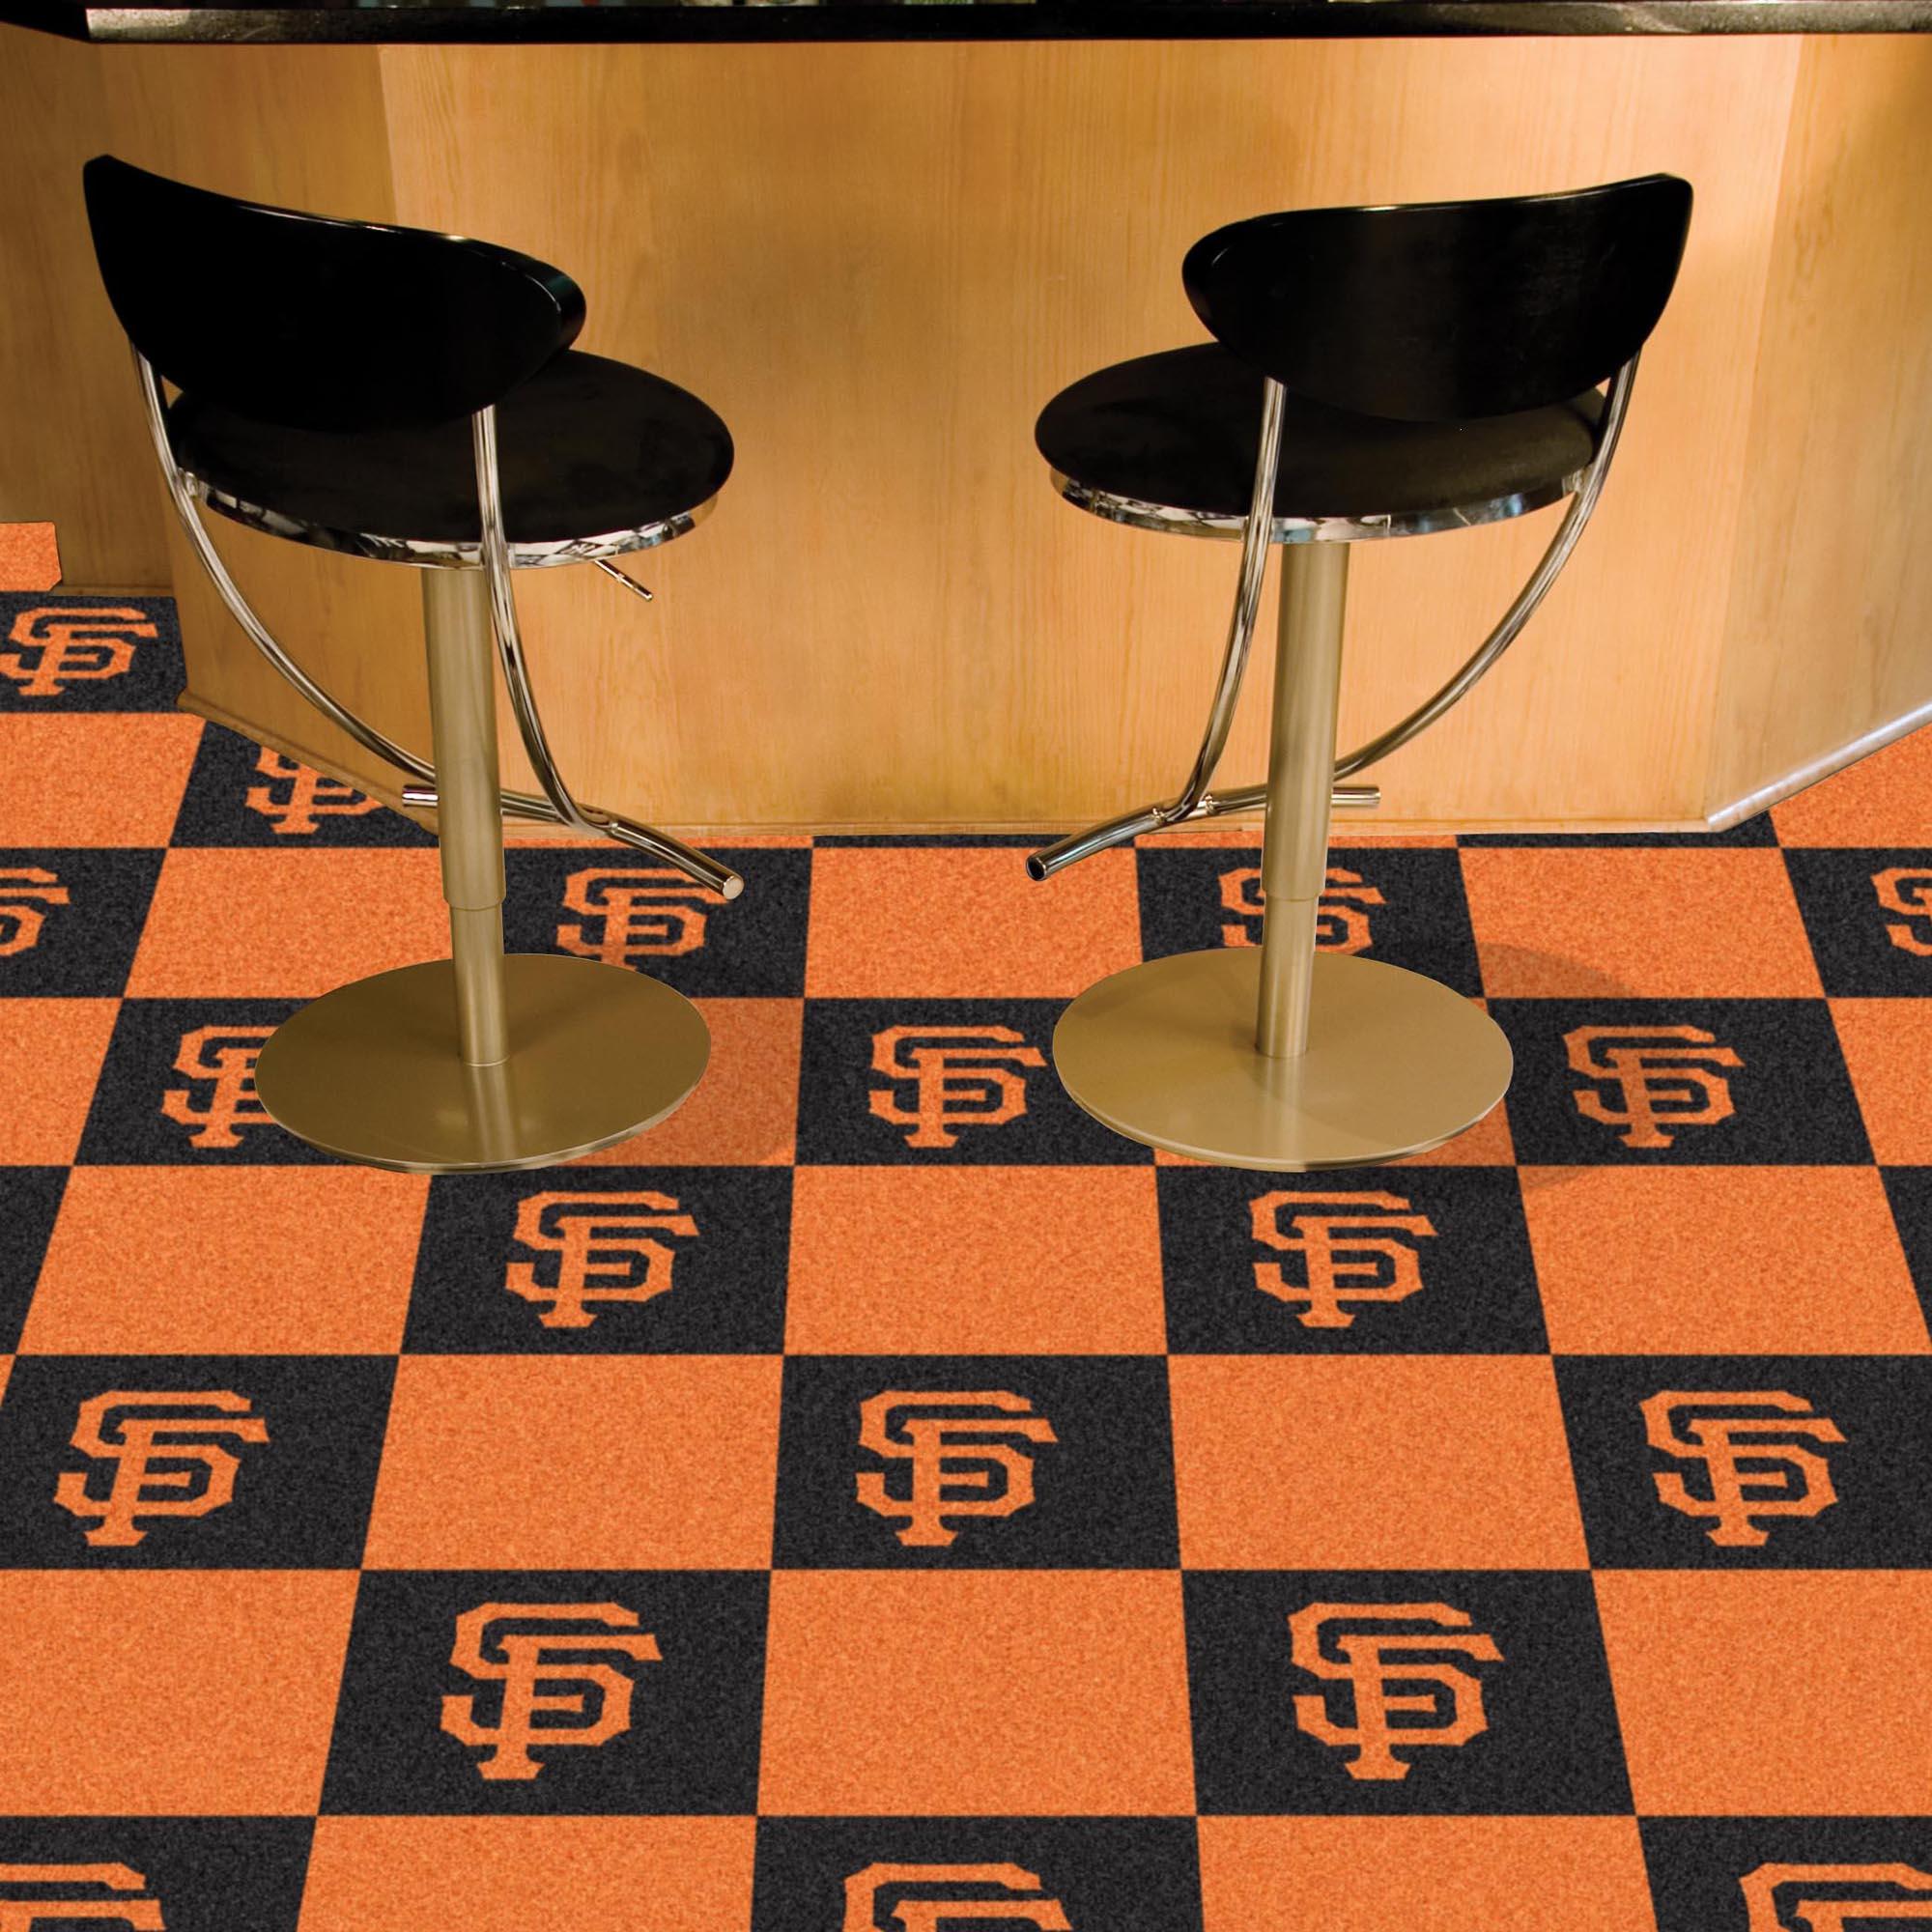 San Francisco Giants Carpet Tiles 18x18 In Buy At Khc Sports